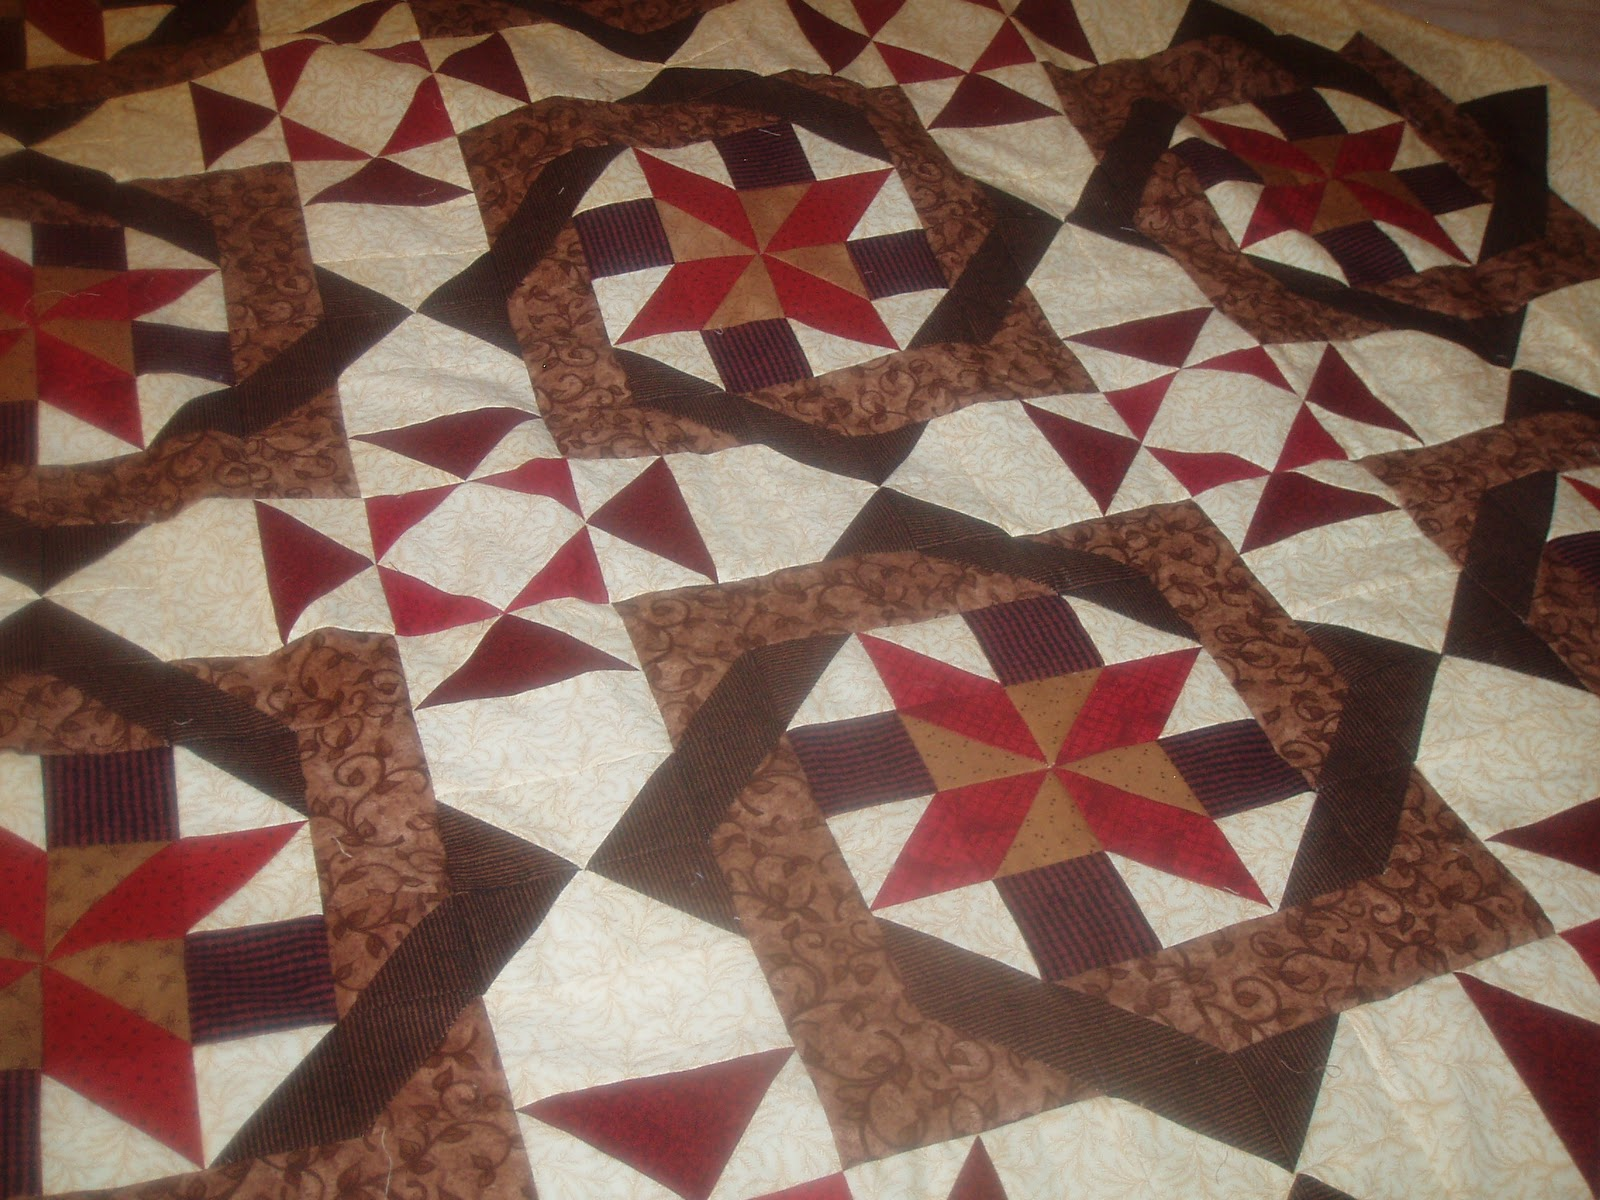 Quilt Patterns For A Man : Quilt Patterns For Men